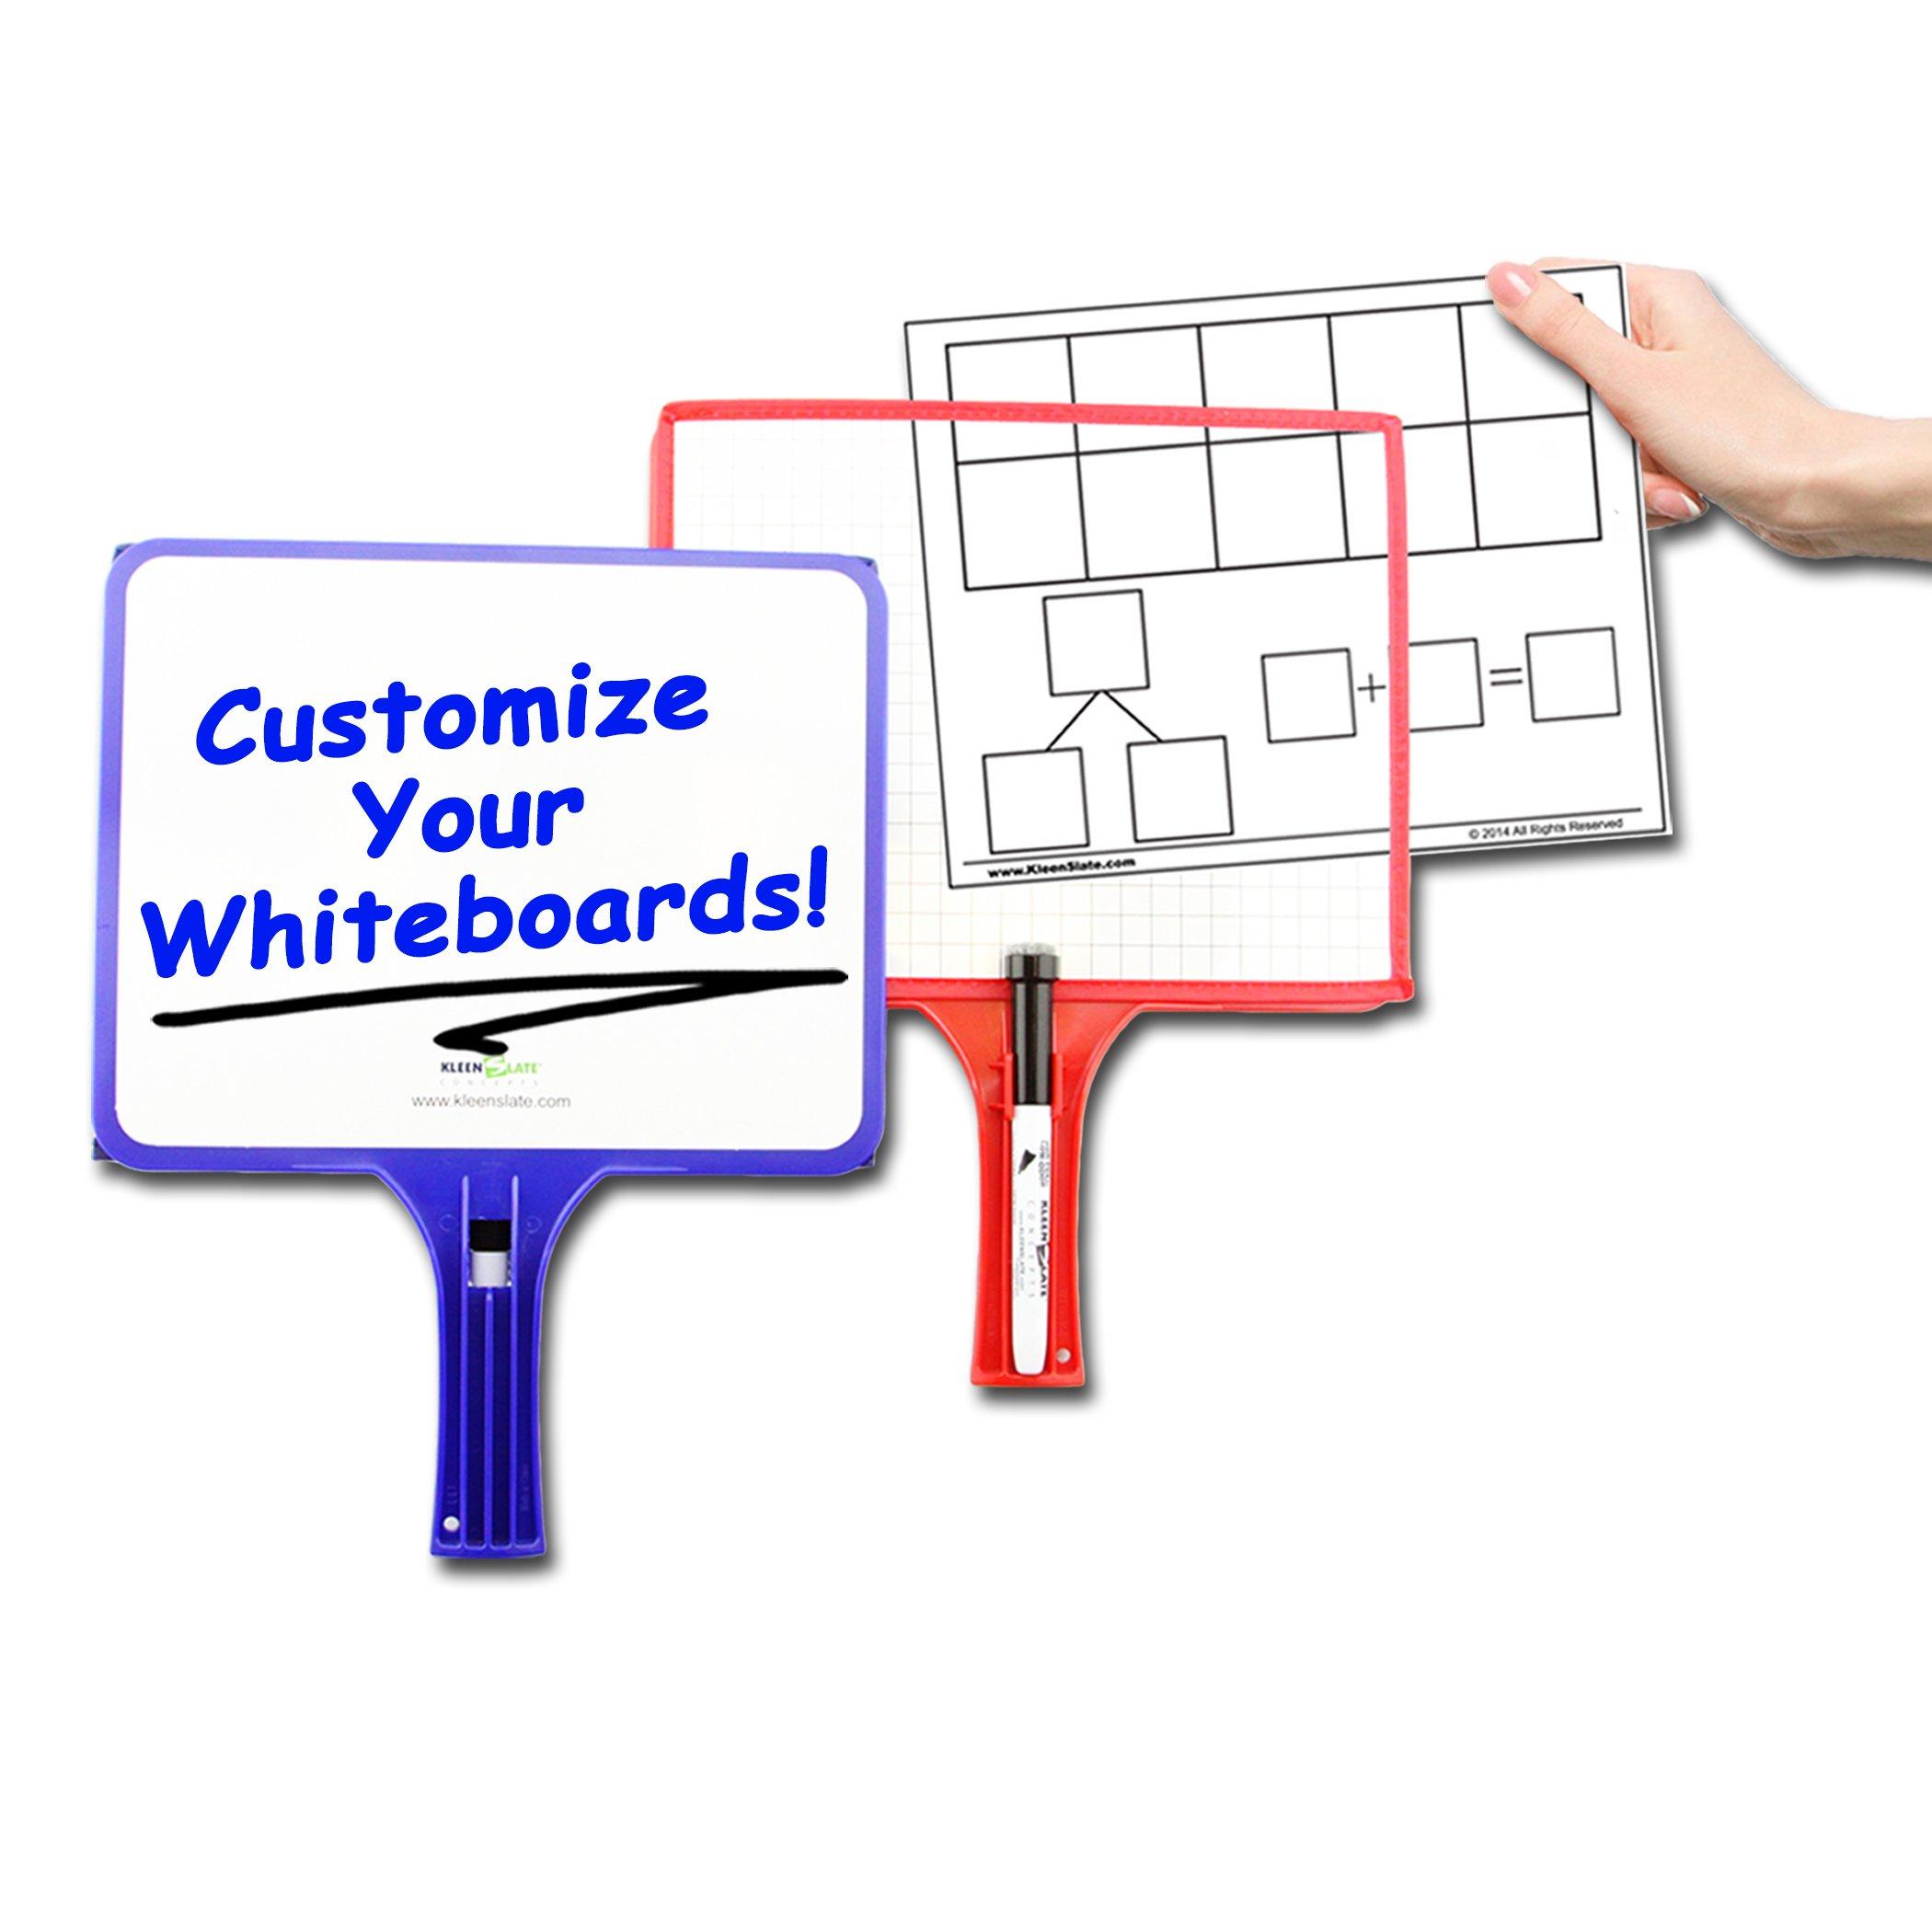 Set of 12 Customizable whiteboards w/Dry Erase Sleeve & Interchangeable Graphic Organizers + Bonus by KleenSlate (Image #5)